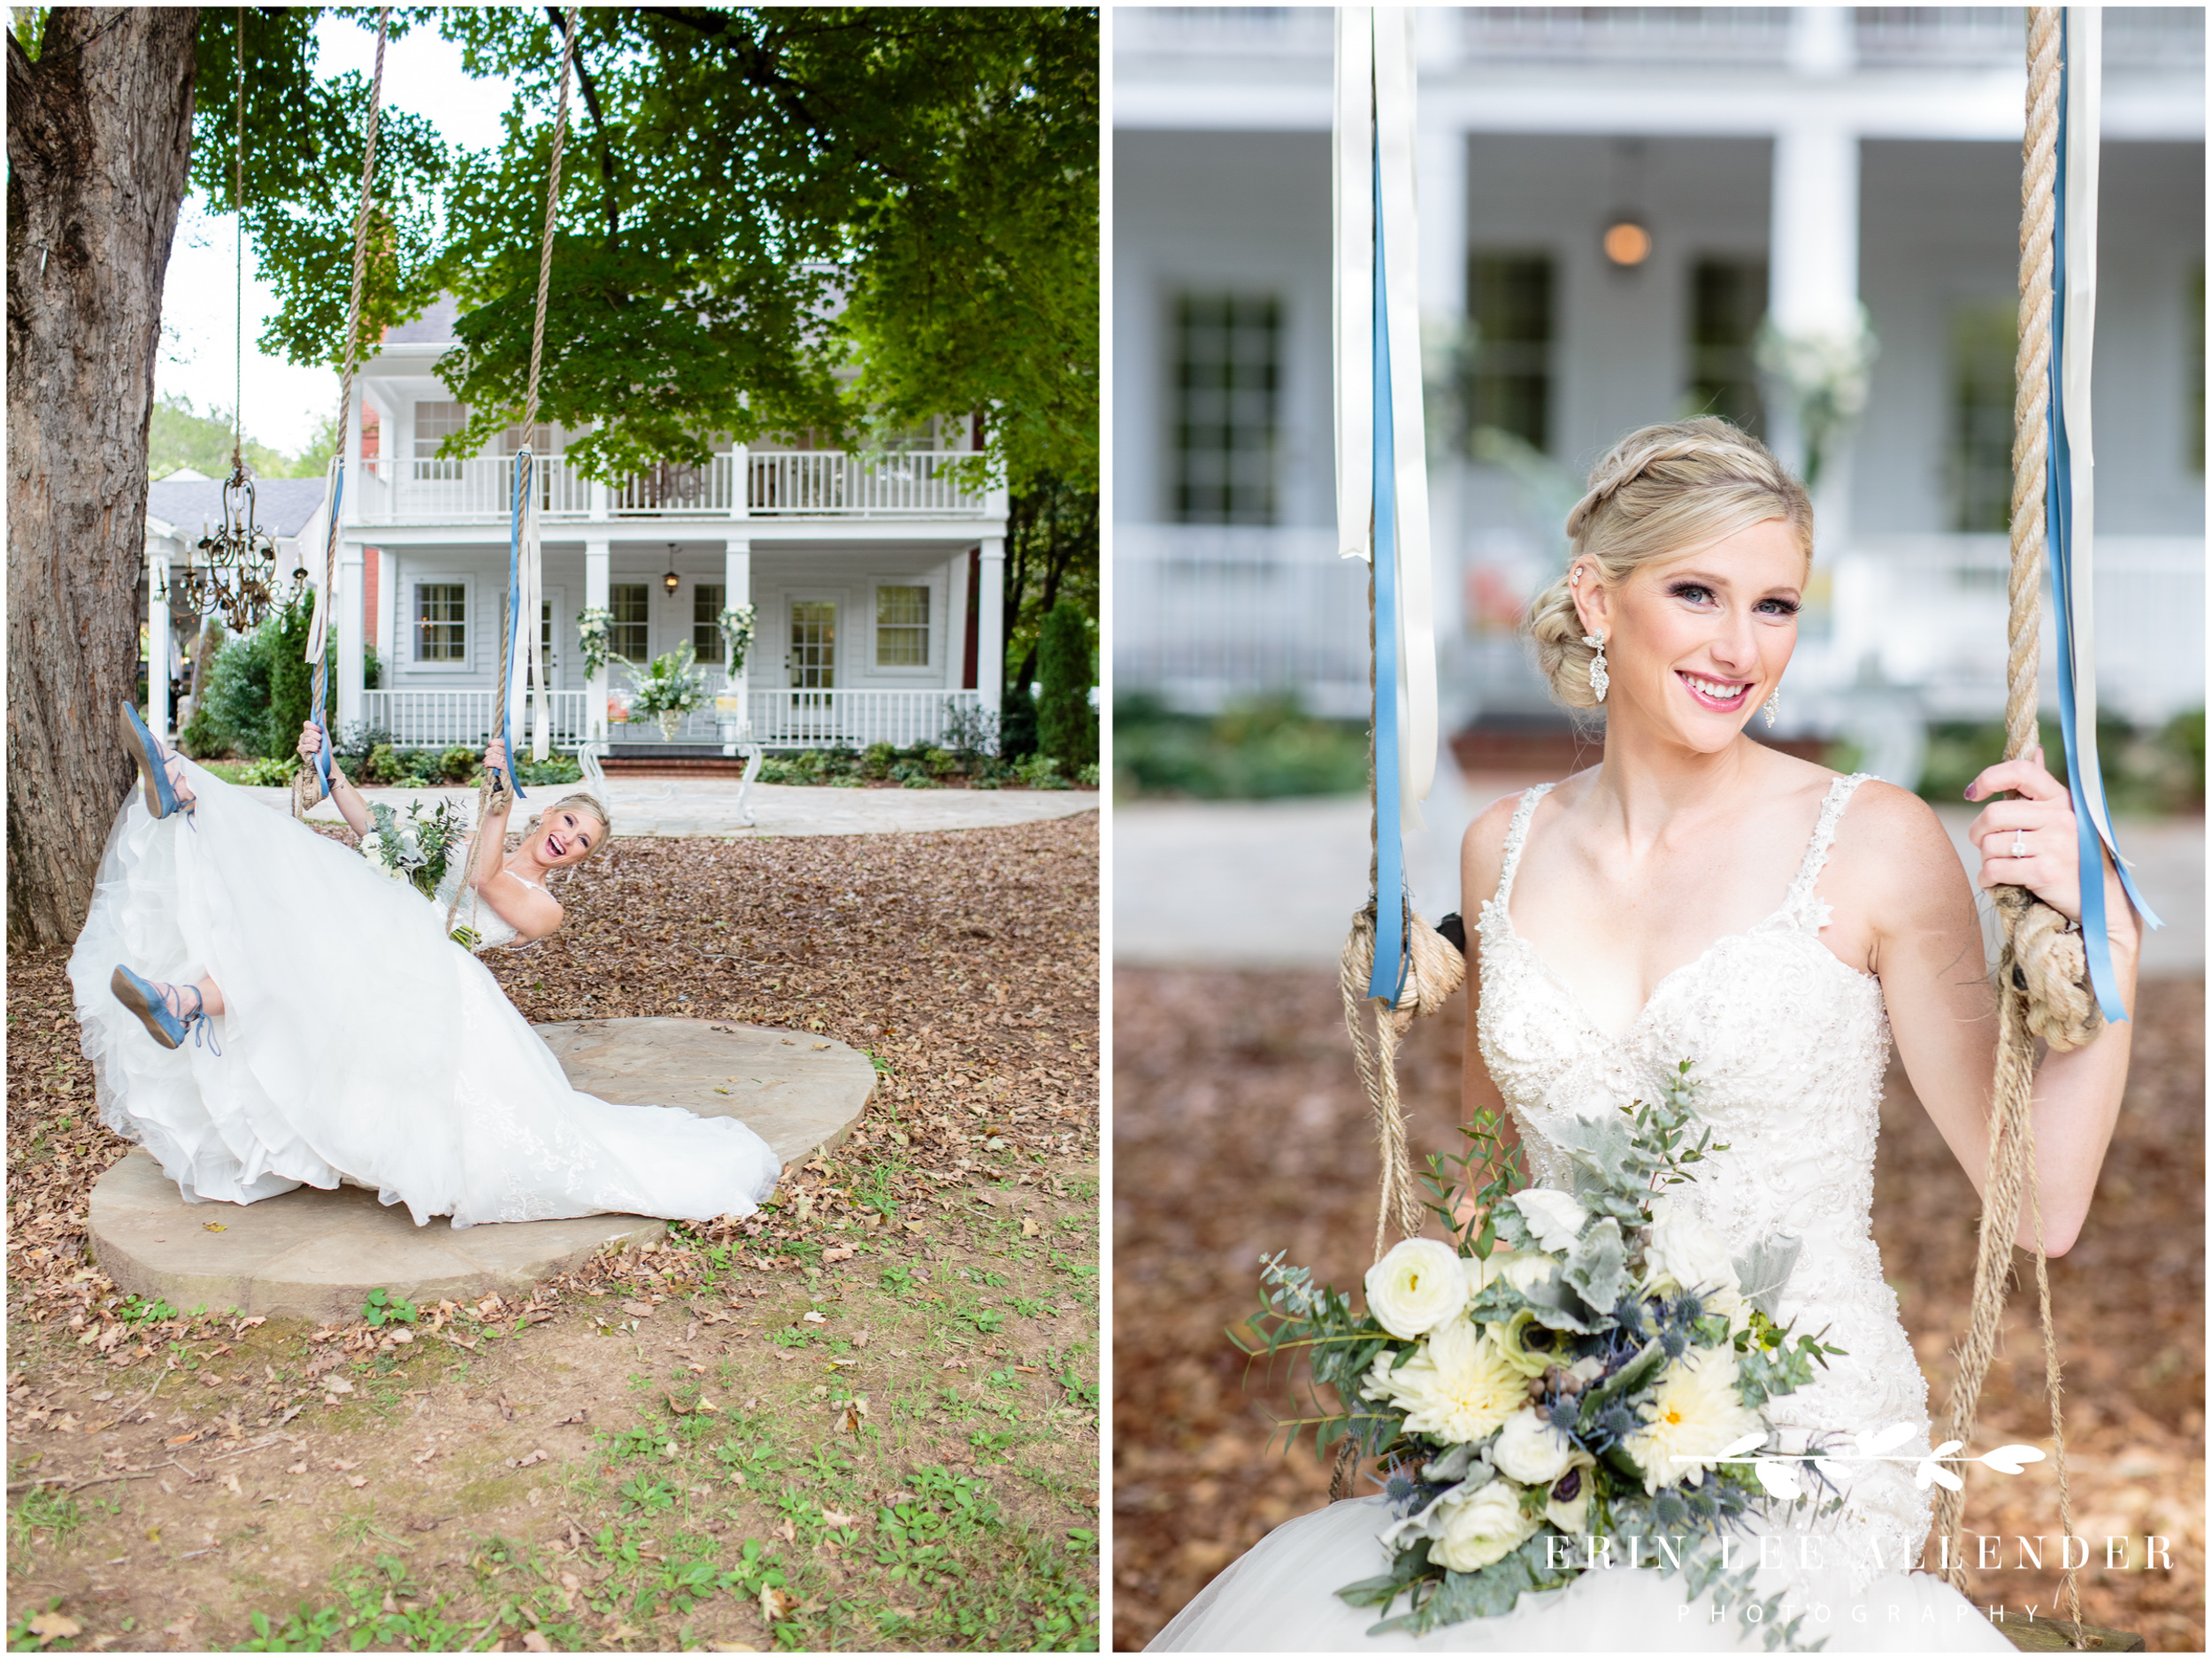 bride-on-cedarwood-swing